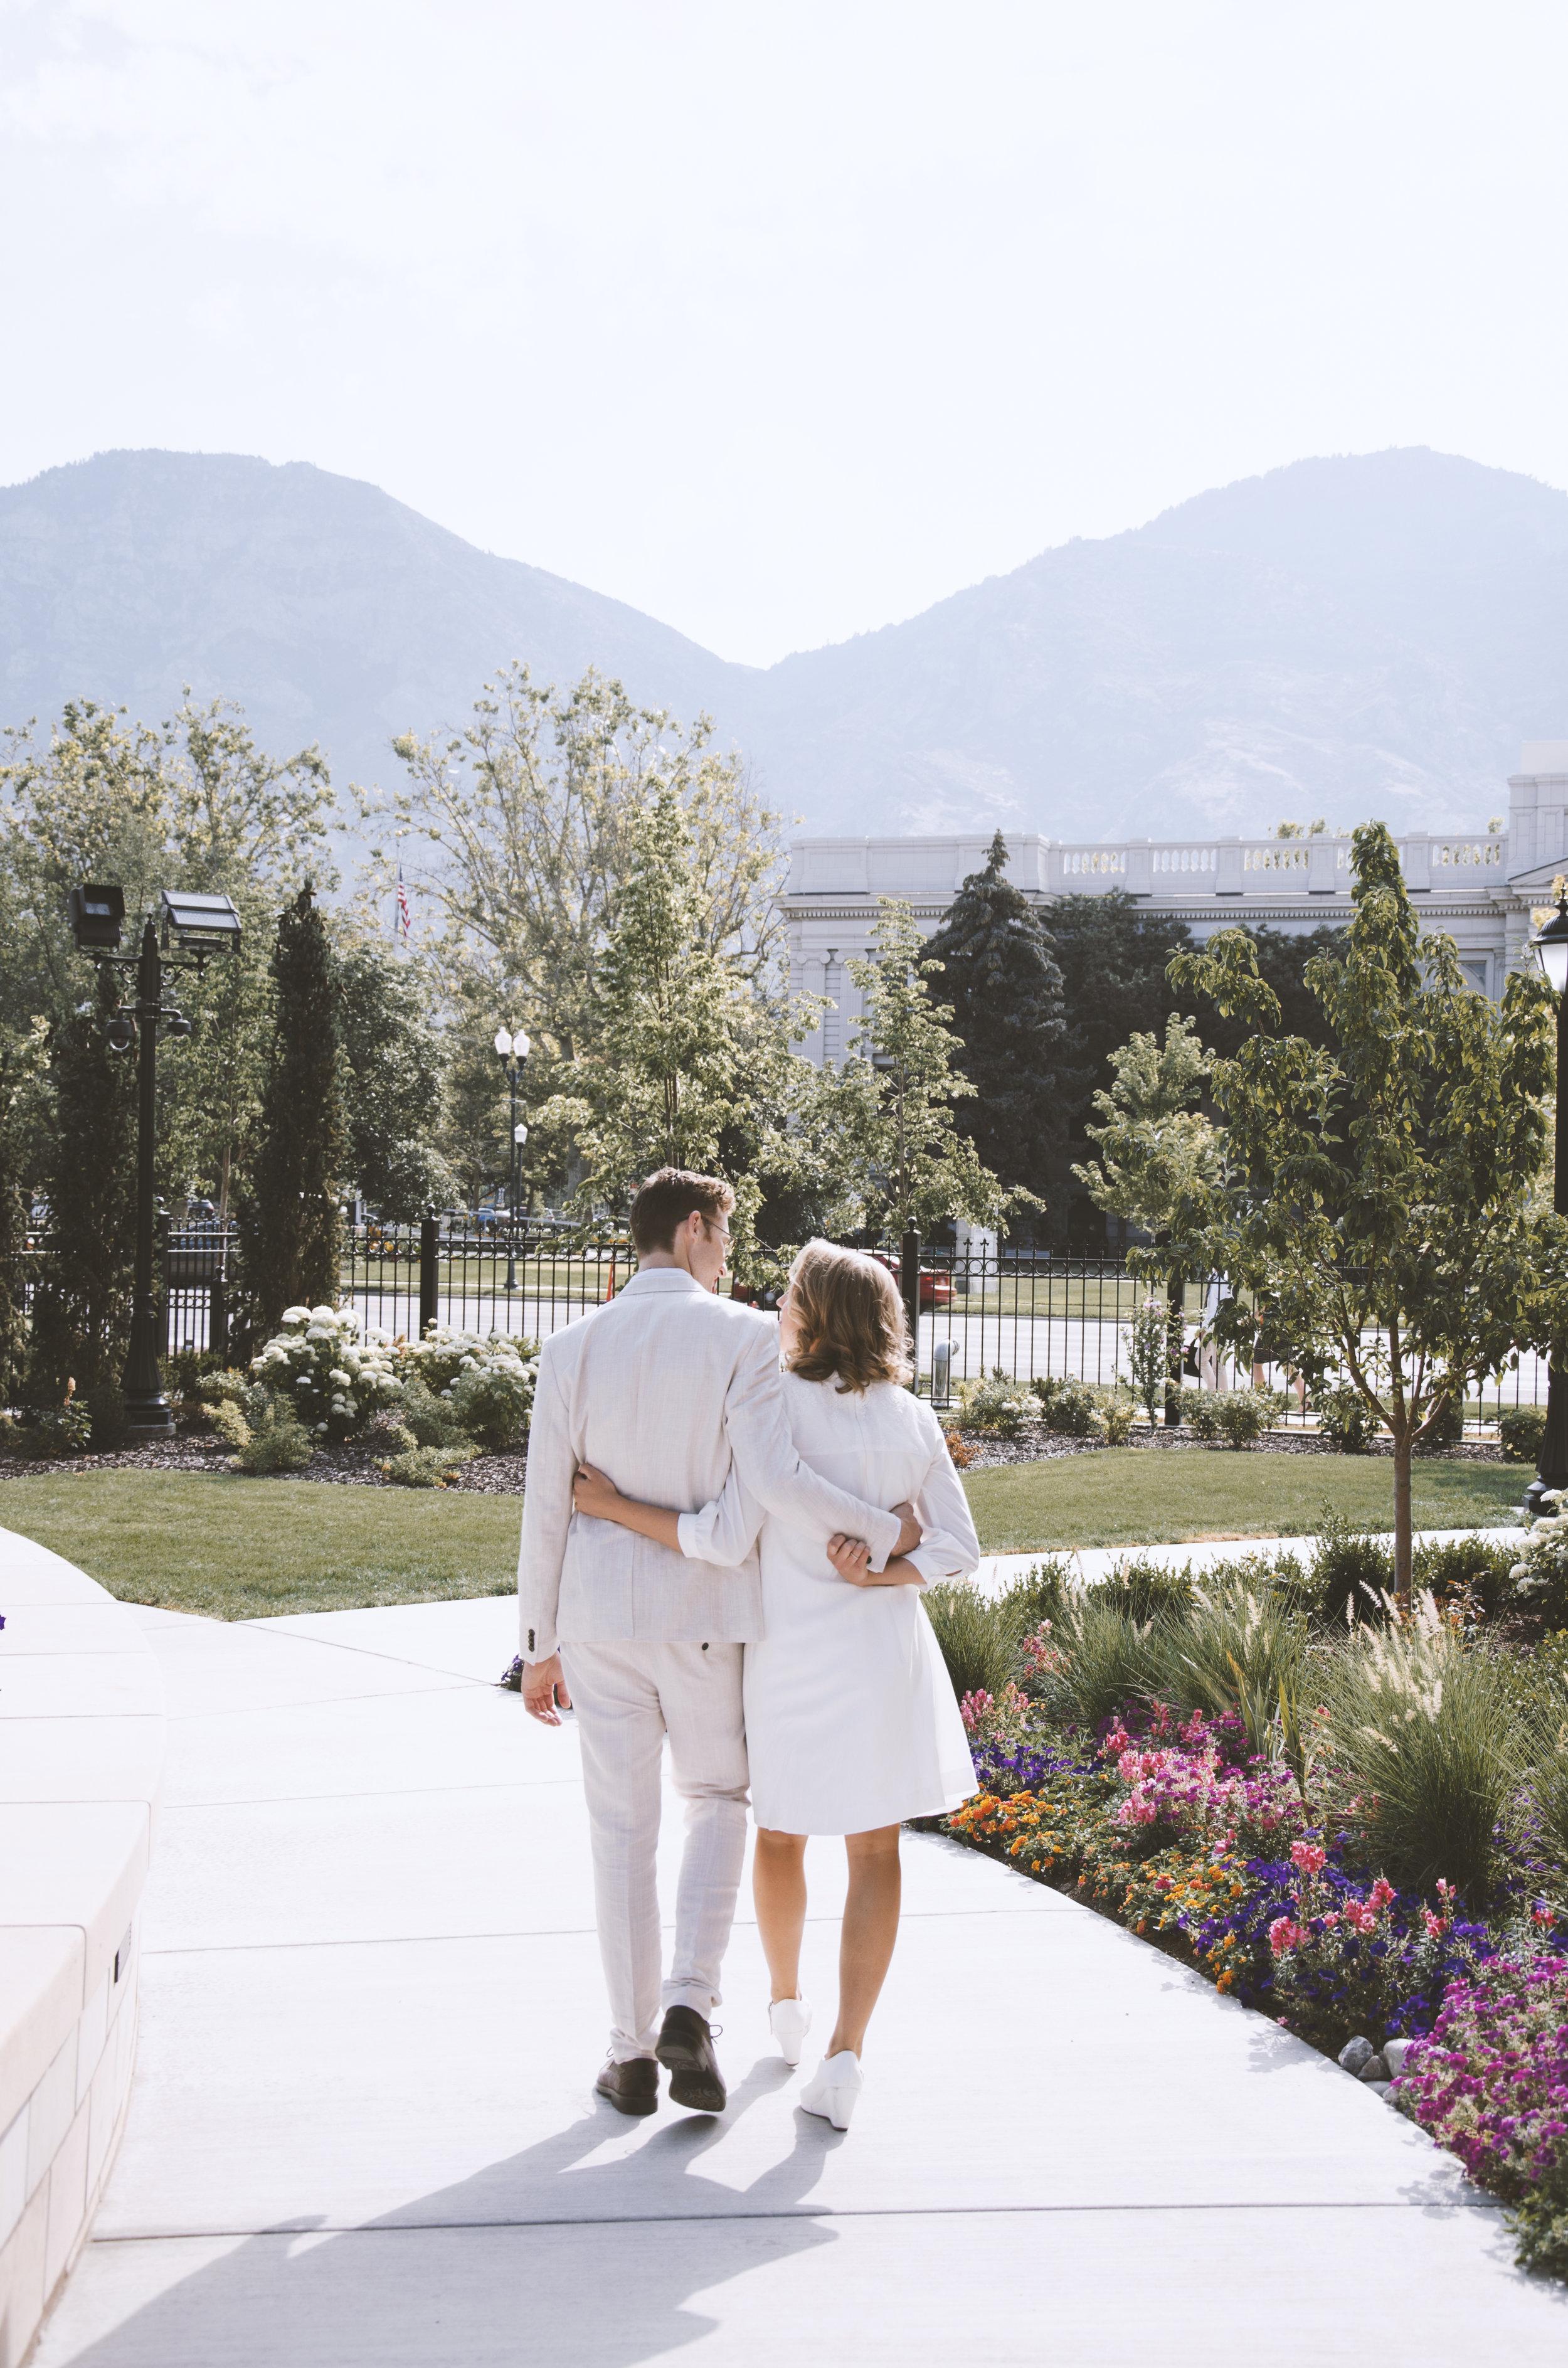 provo wedding photographer nikra.jpg